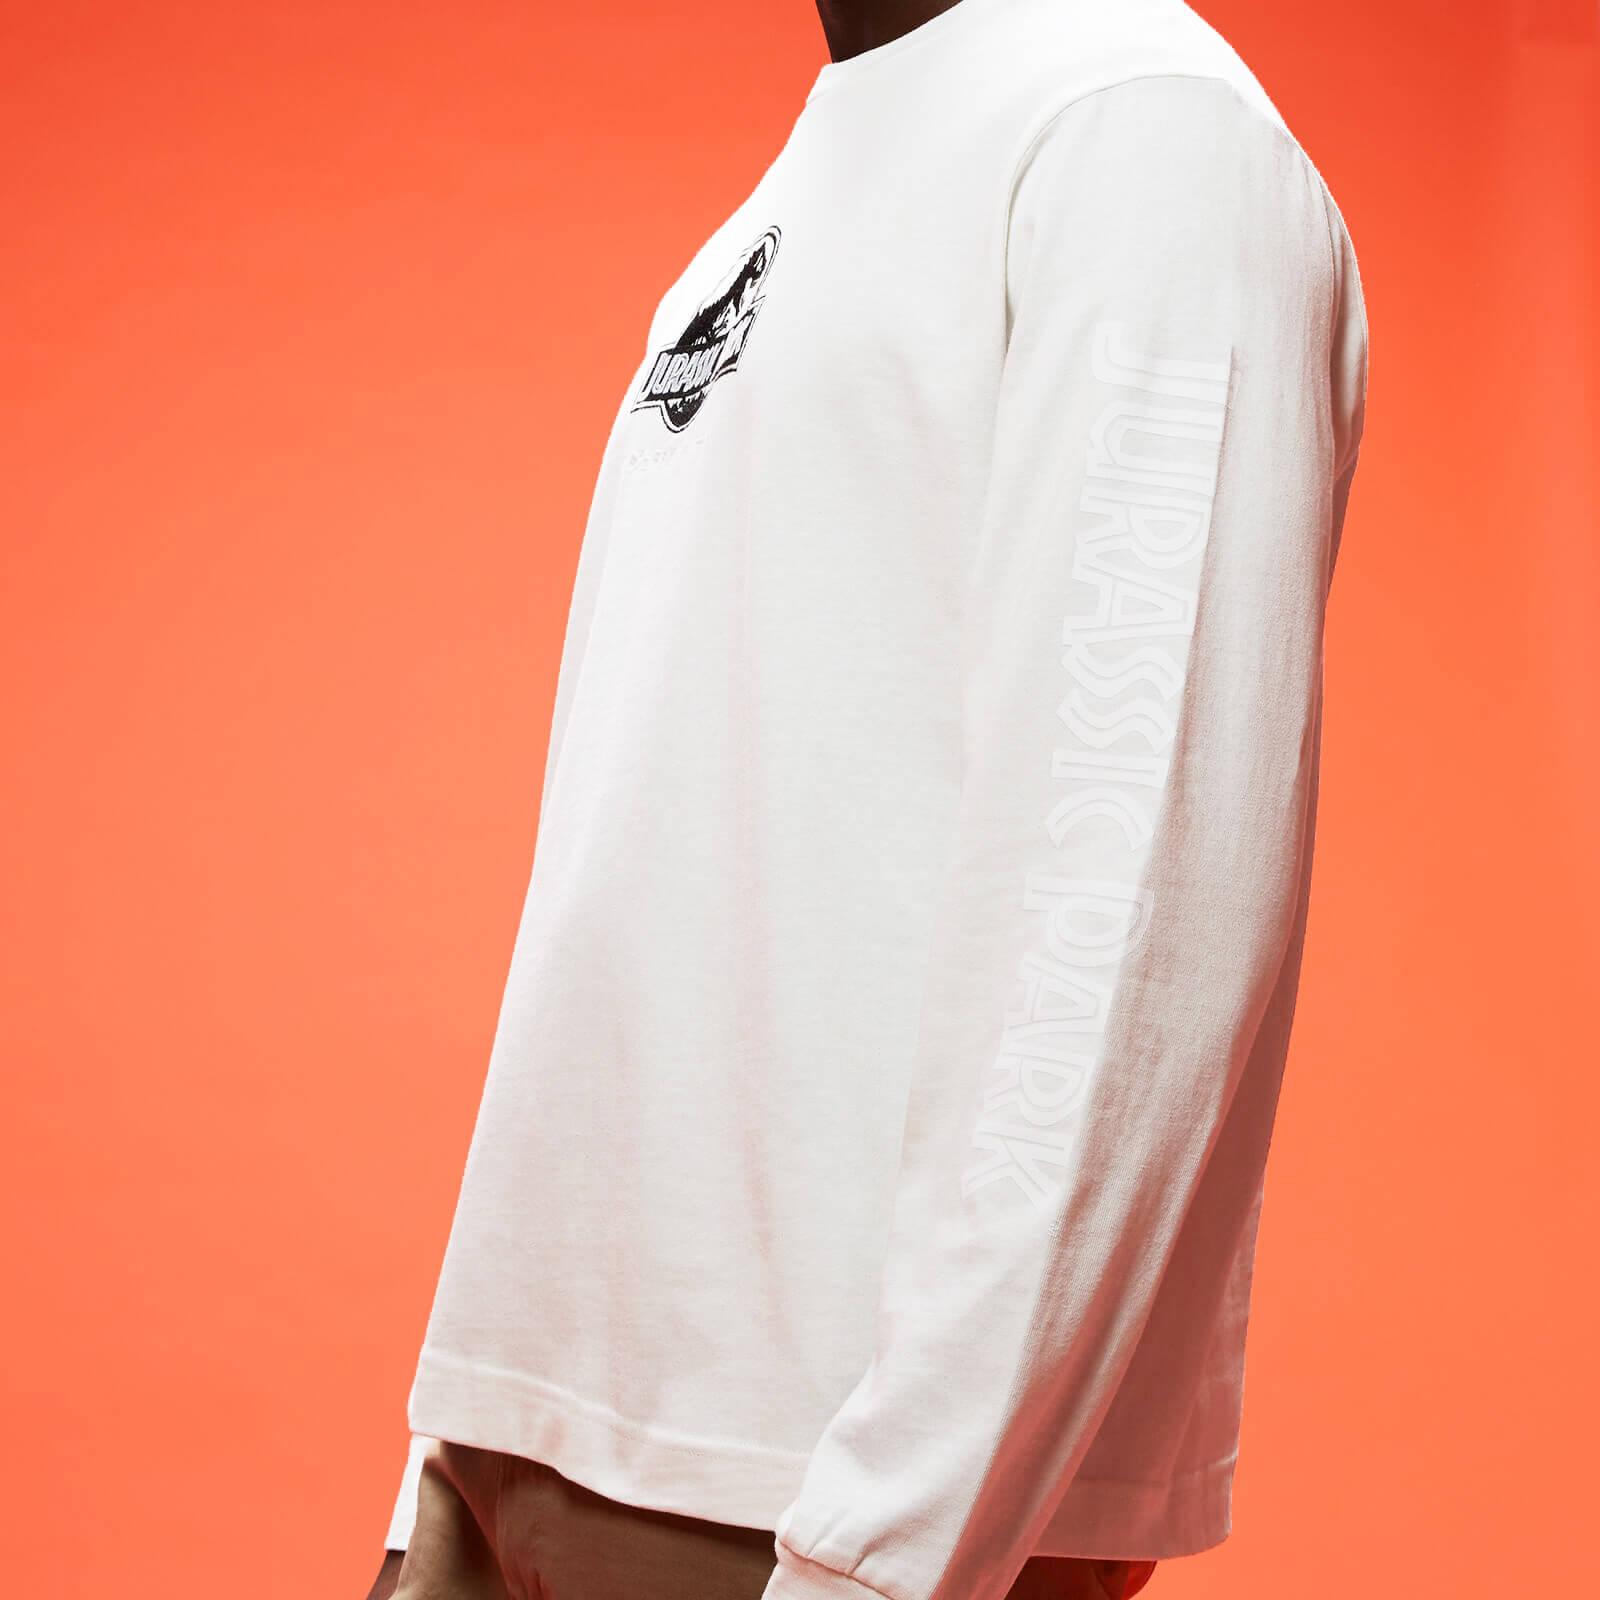 Jurassic Park Primal Embroidered Long Sleeve T-Shirt - Cream - XXL - Cream